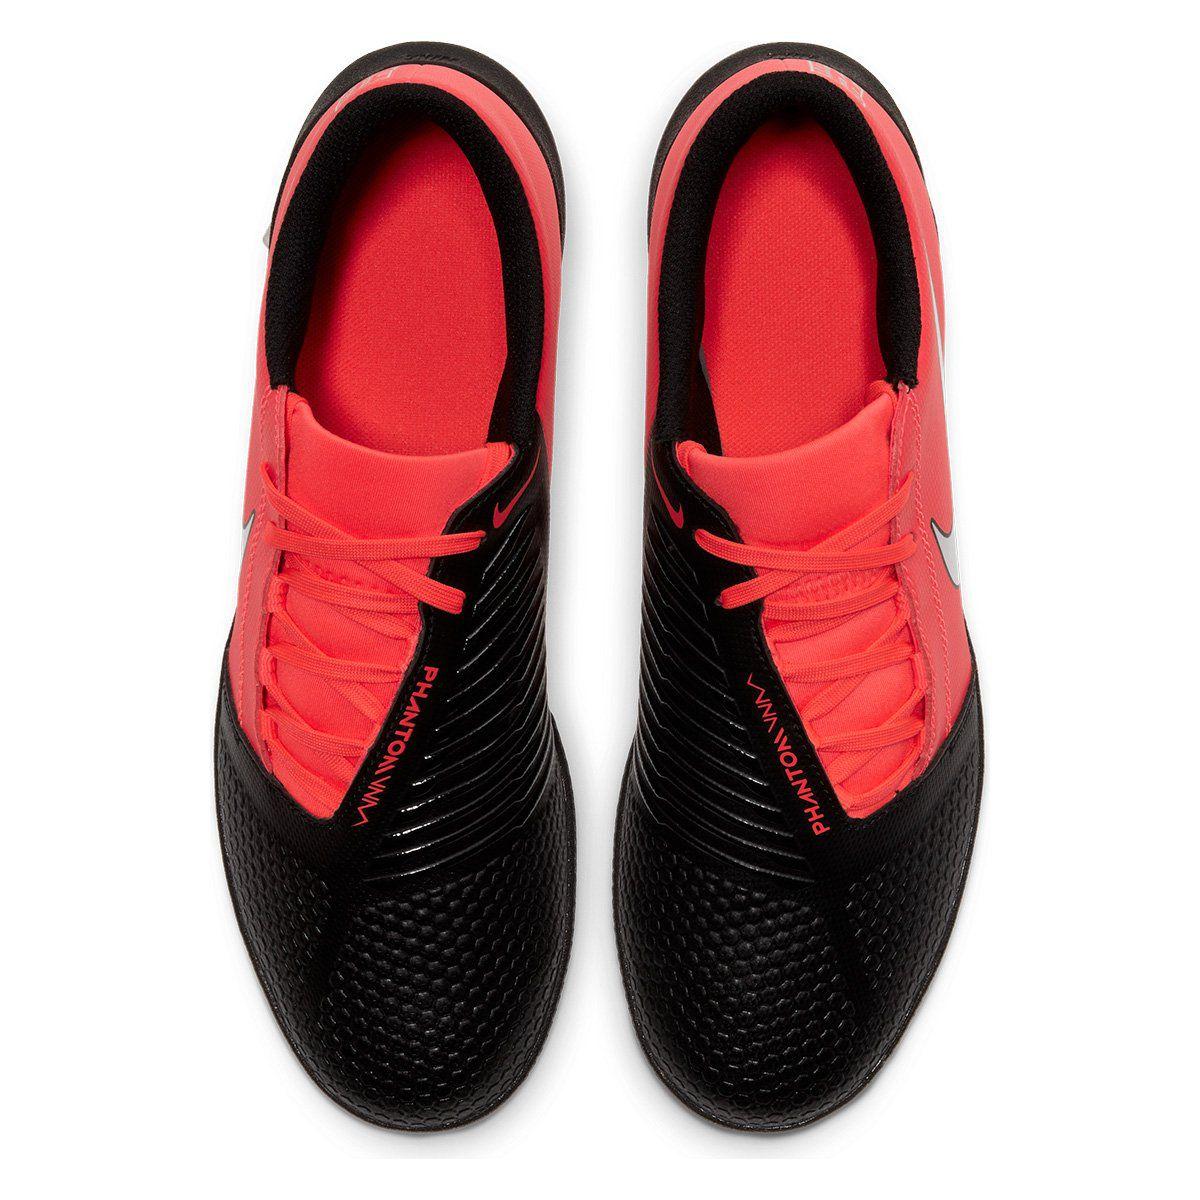 Tenis Chuteira Futsal Esportivo Masculino Nike Phantom Venom